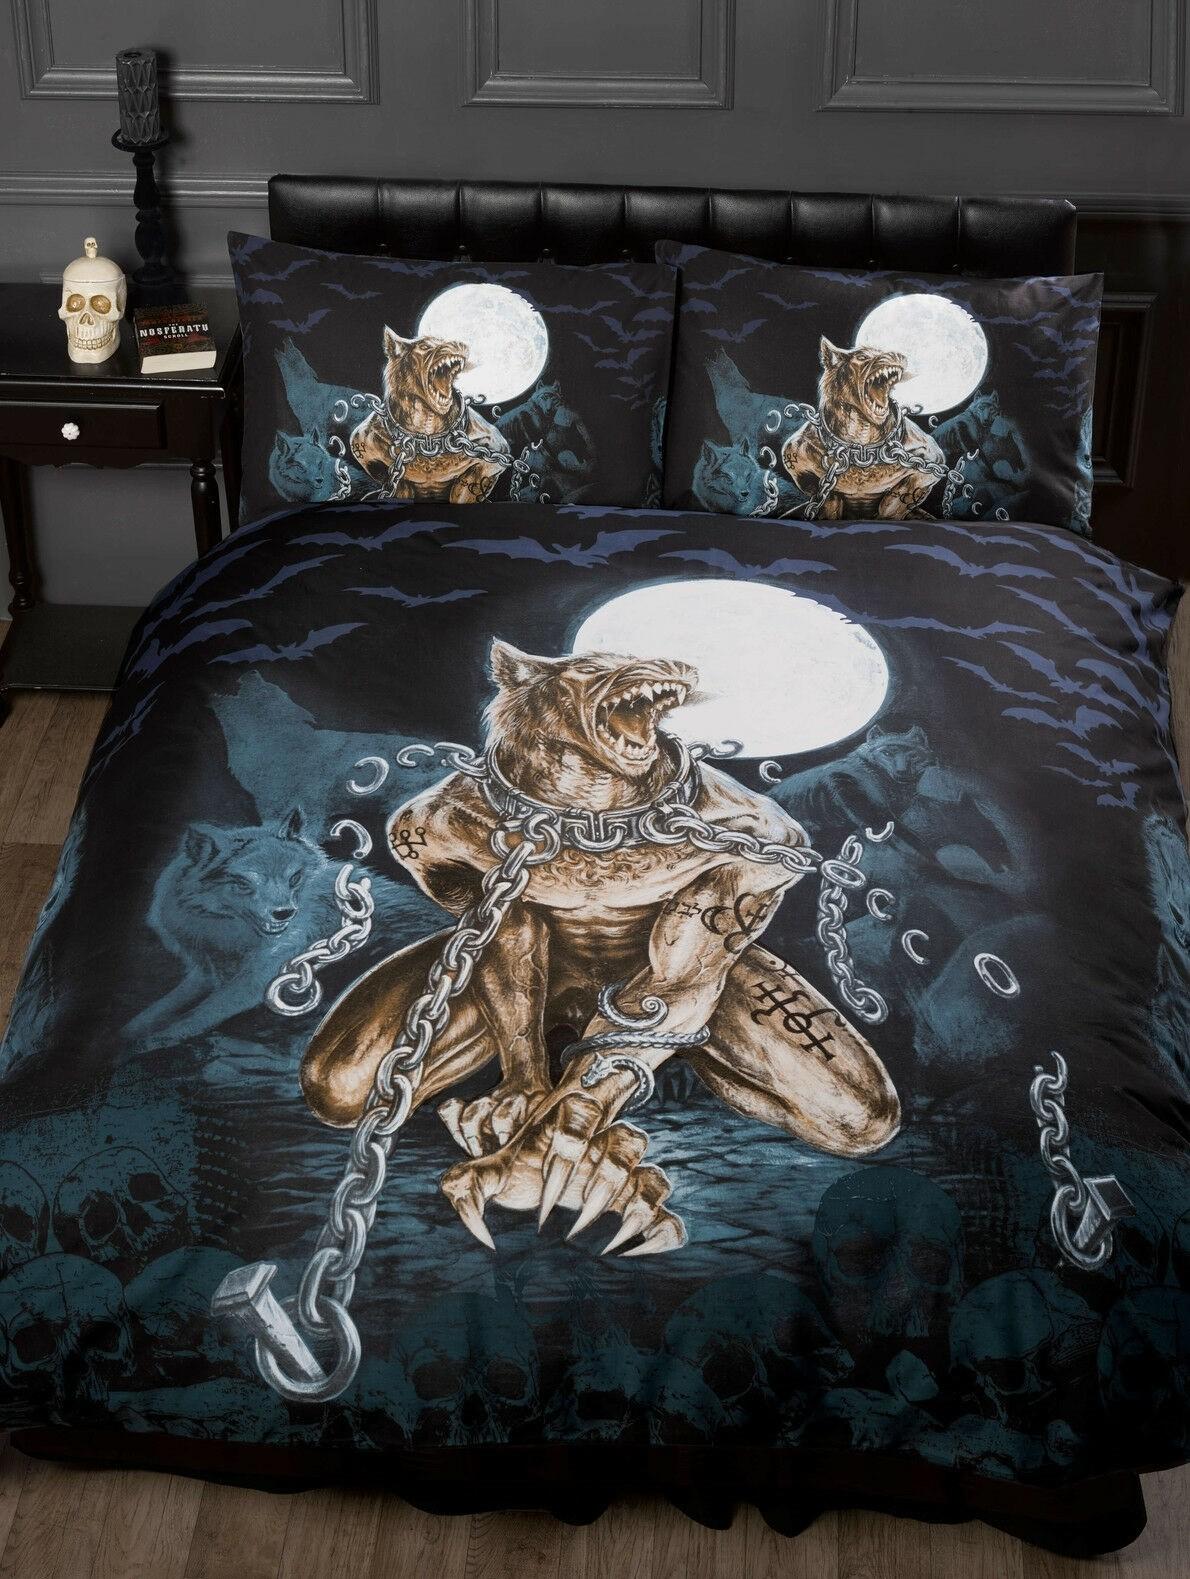 Double Size Alchemy Loups Garou Design Gothic Duvet Cover & Matching Pillowcases